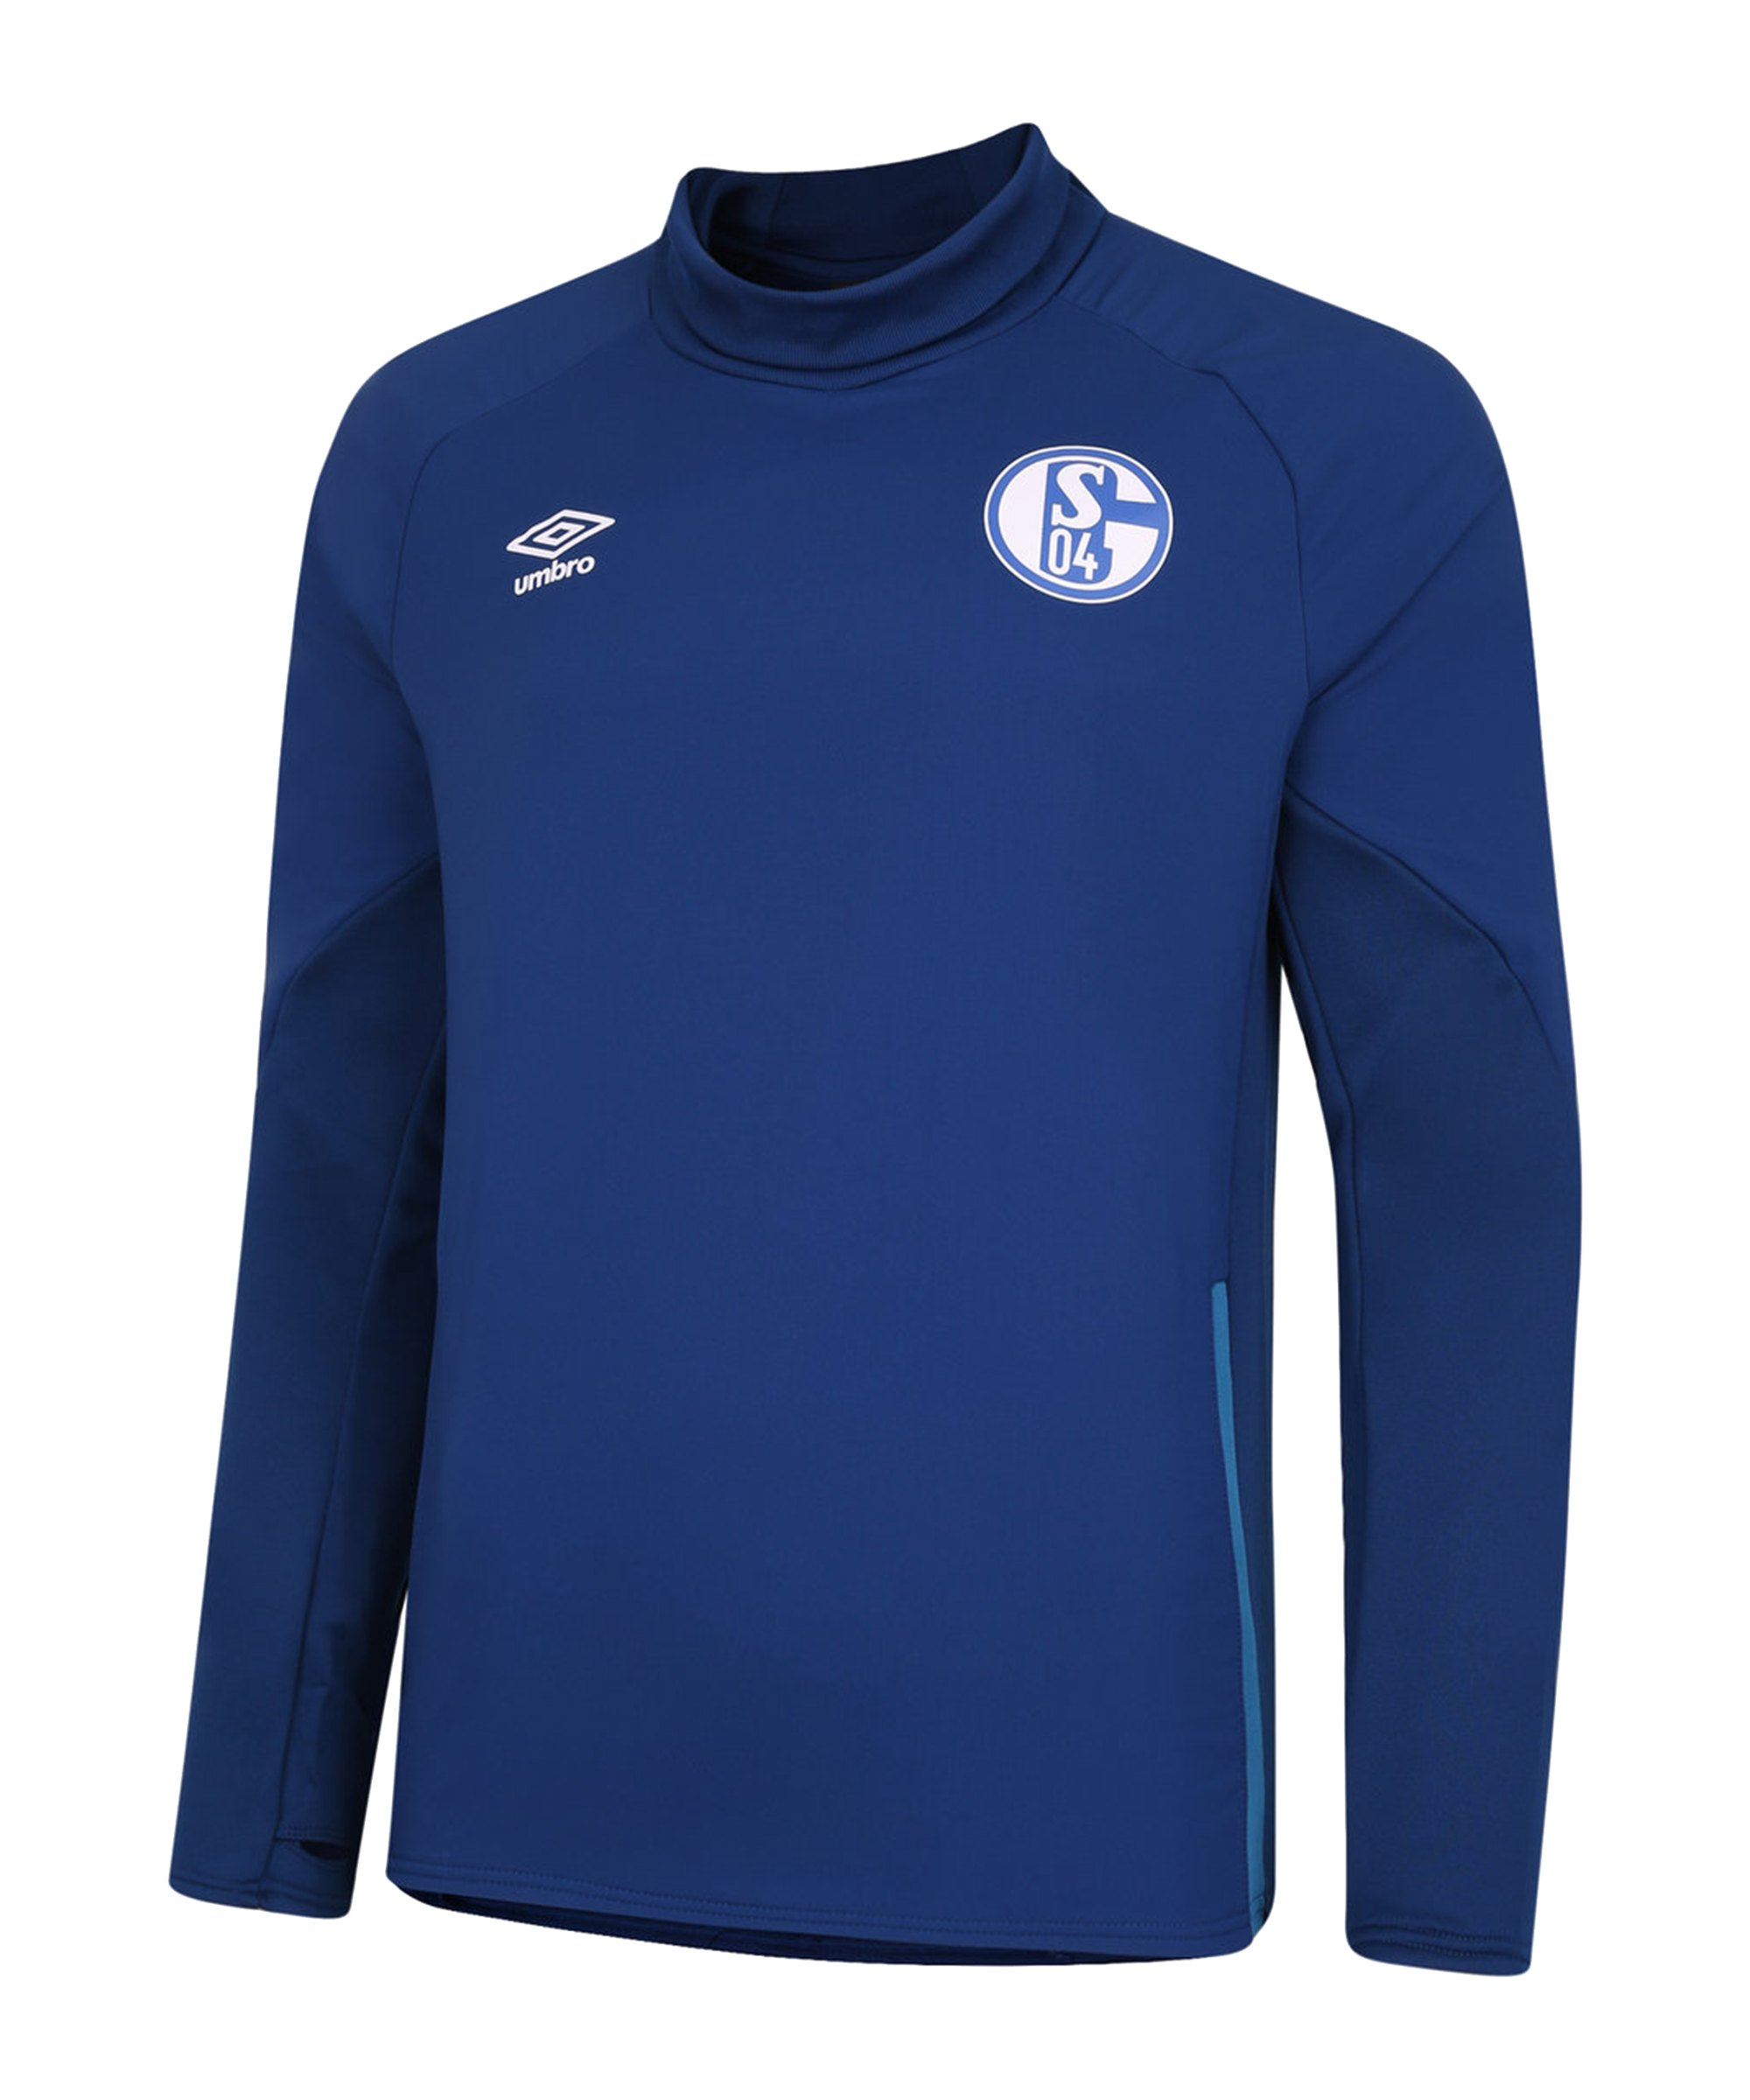 FC Schalke 04 Drill Top Blaue FJRE - blau